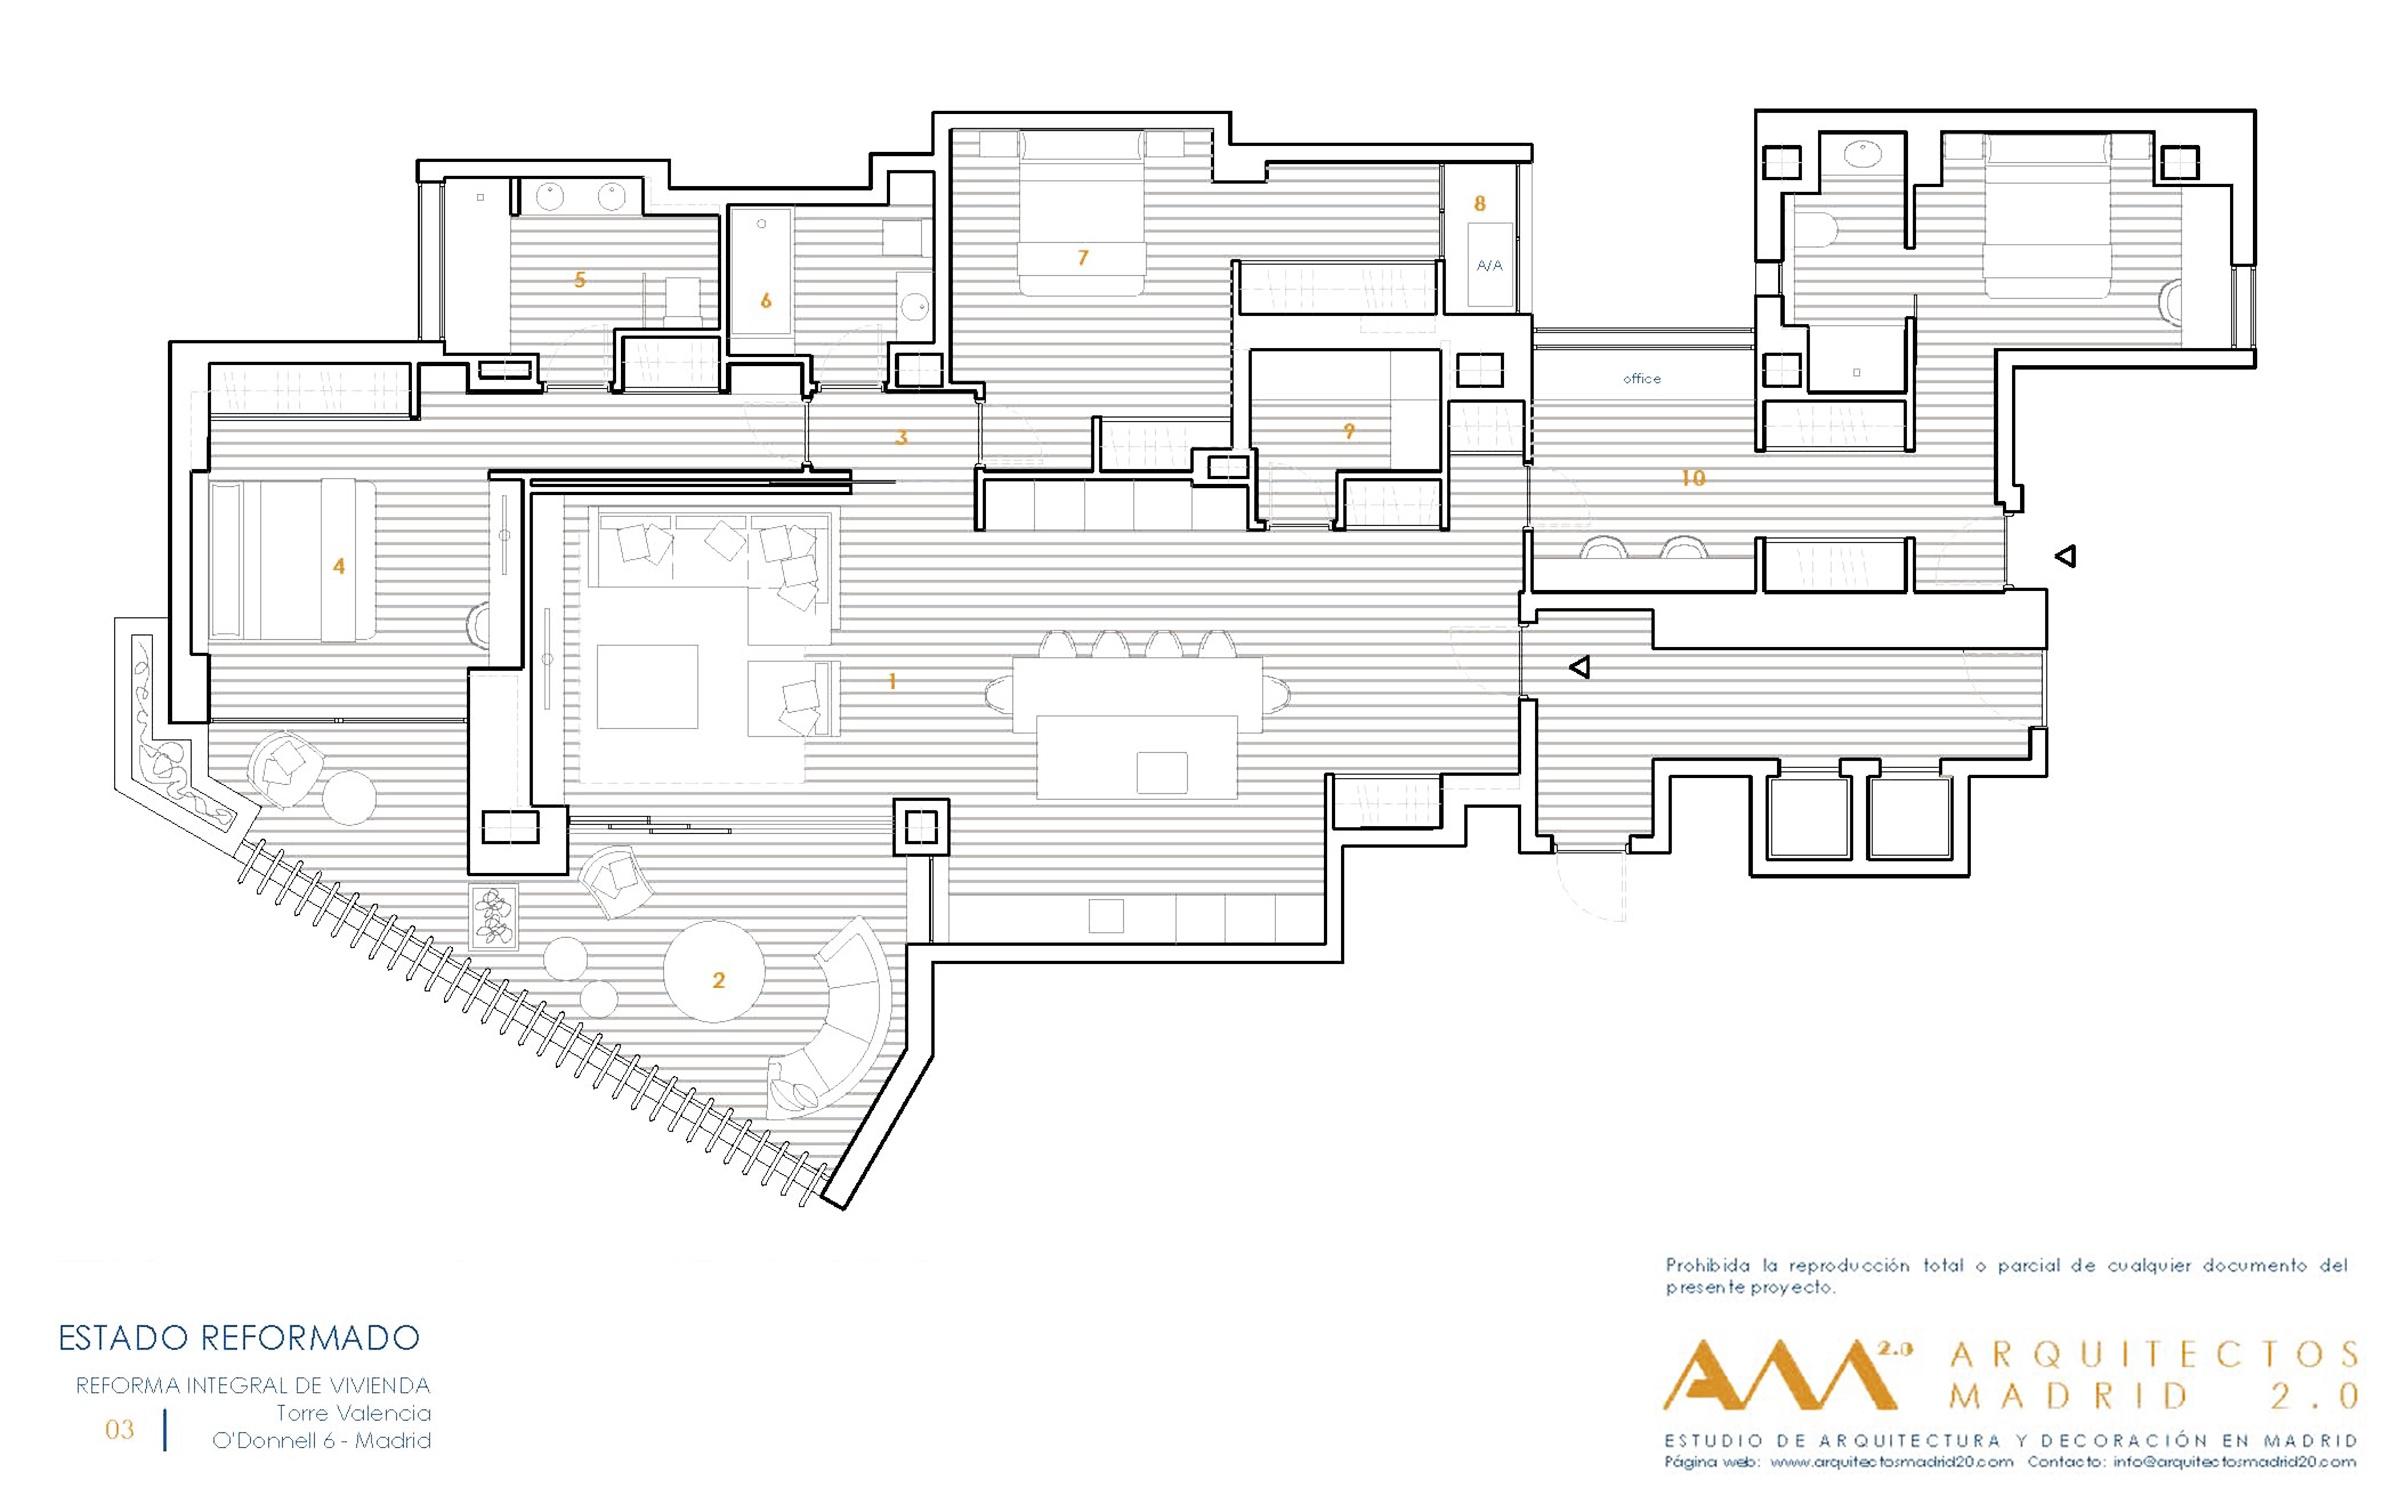 proyecto-reforma-apartamento-lujo-torre-valencia-retiro-madrid-arquitectos-madrid-planta-01